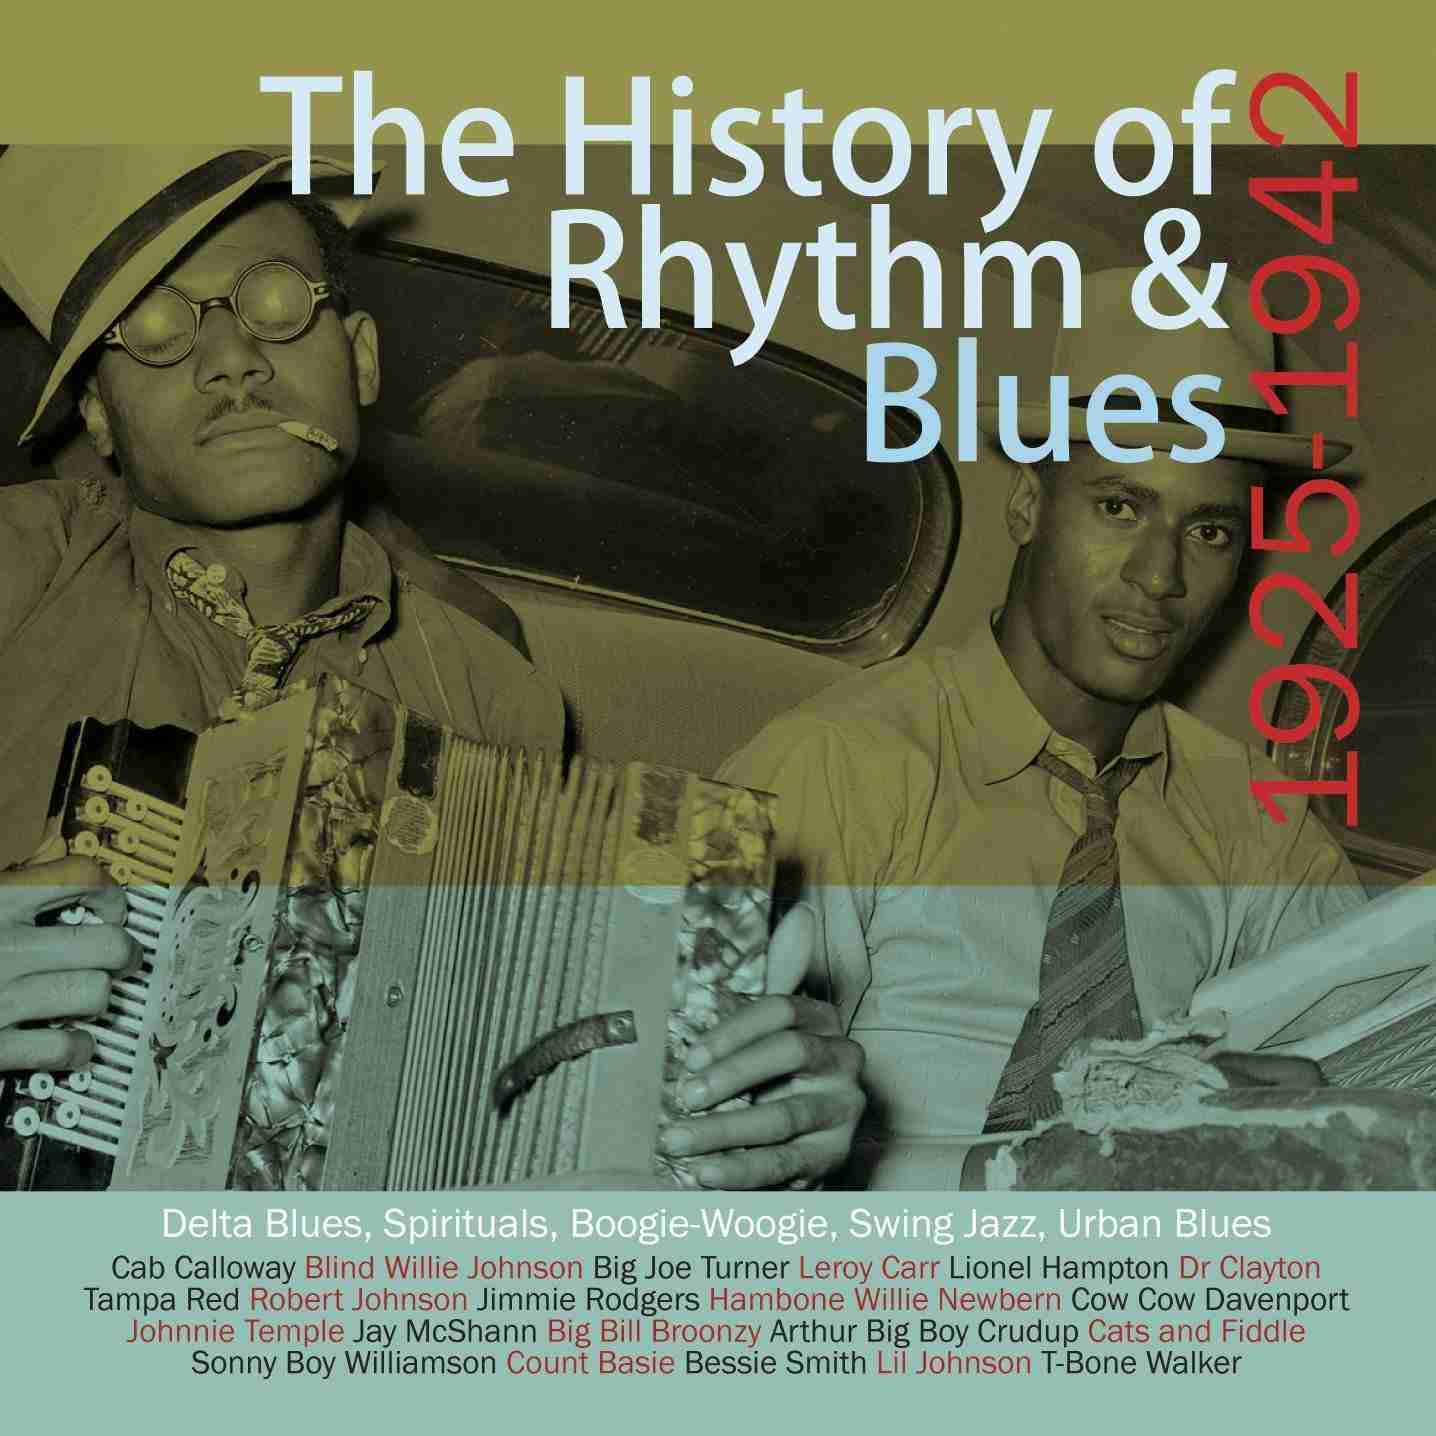 The History of Rhythm & Blues Volume One 1925-1942 4CD